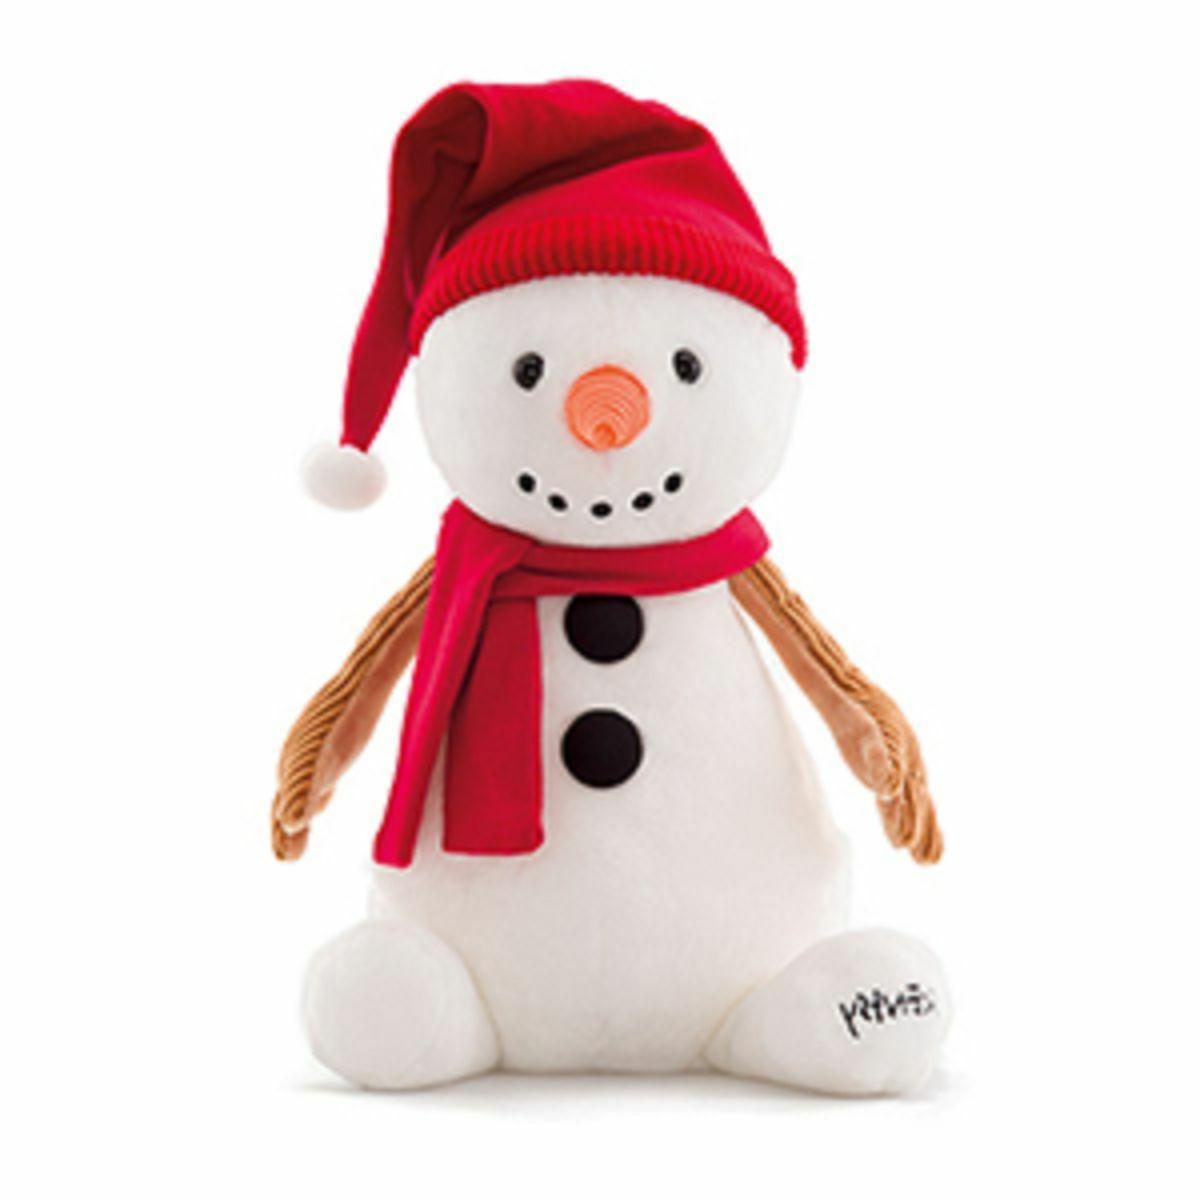 Authentic Scentsy Sammy the Snowman Stuffed Animal & Bonus J